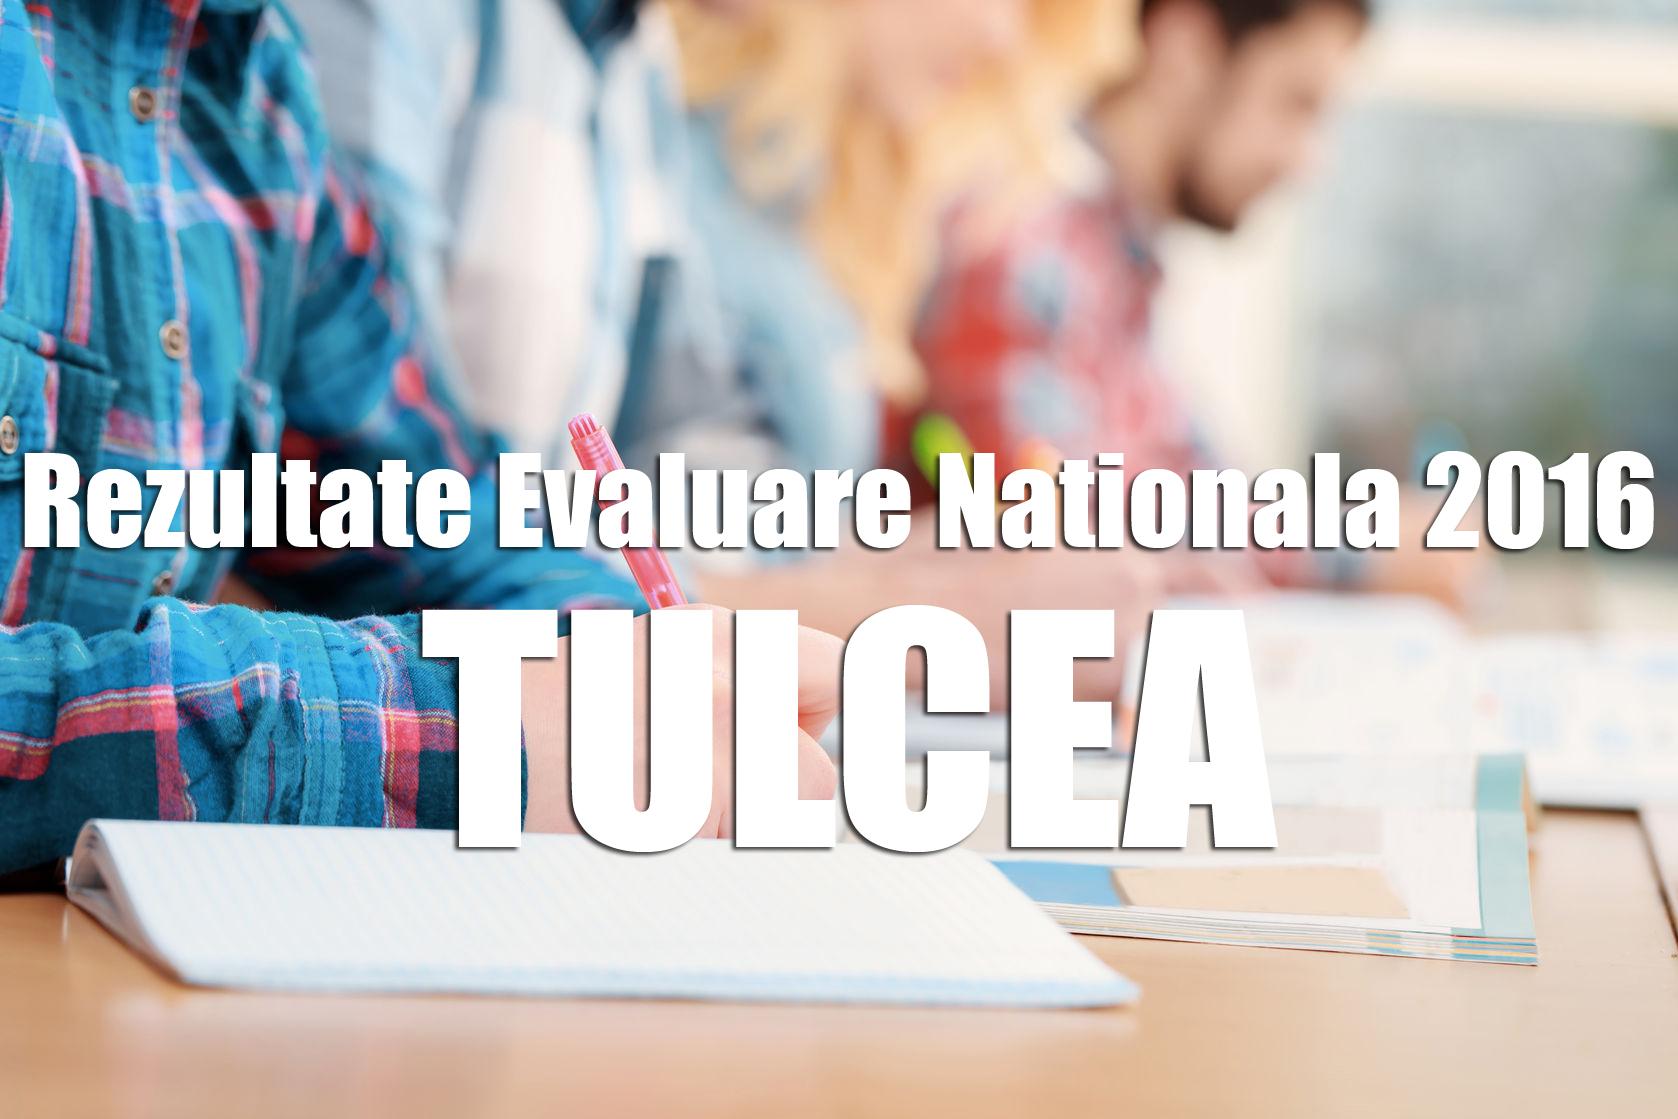 Edu.ro: Rezultate Evaluare Nationala 2016 TULCEA. Note obtinute